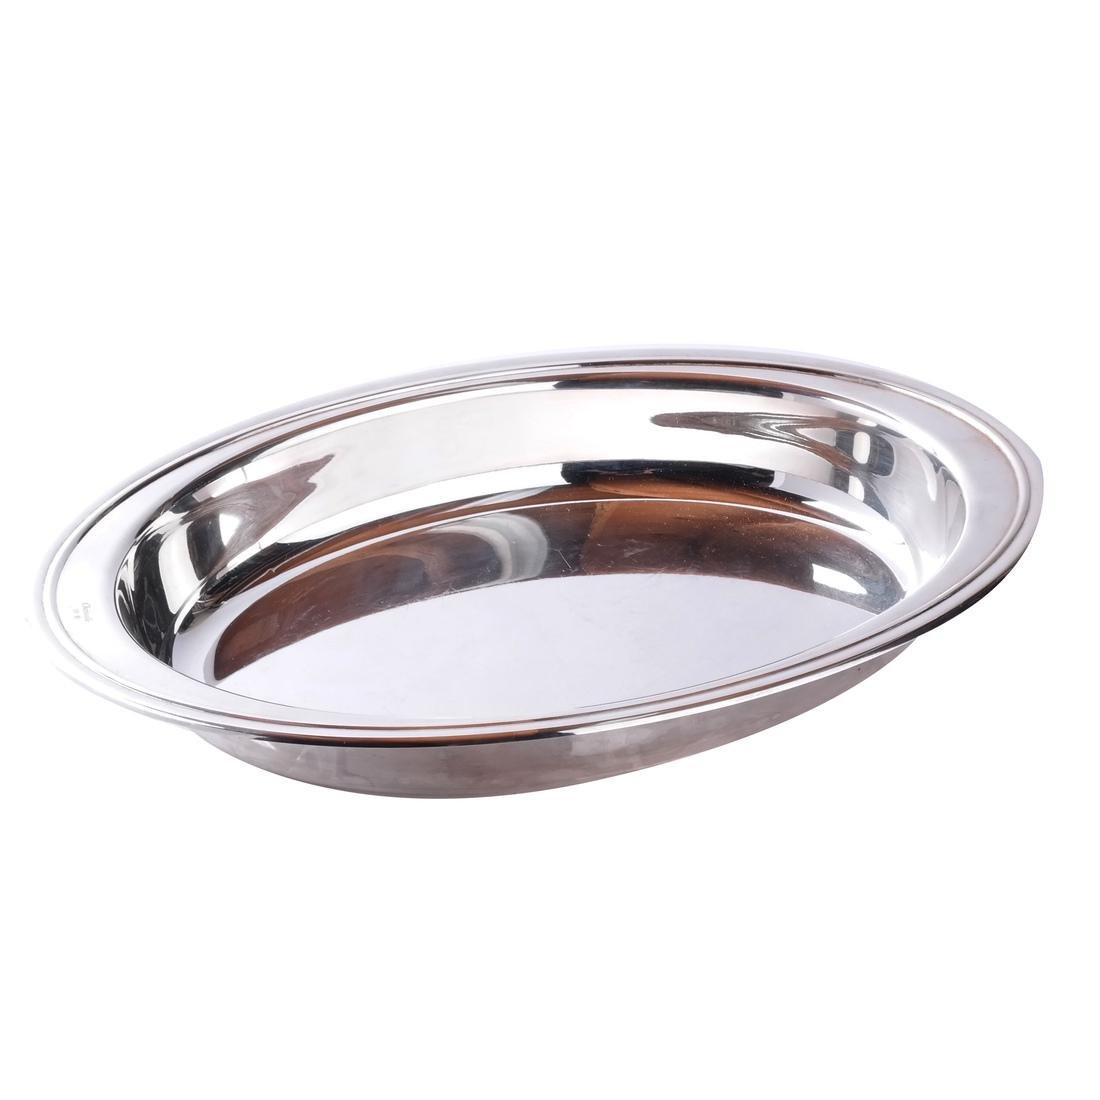 Christofle Silver Plate Deep Dish